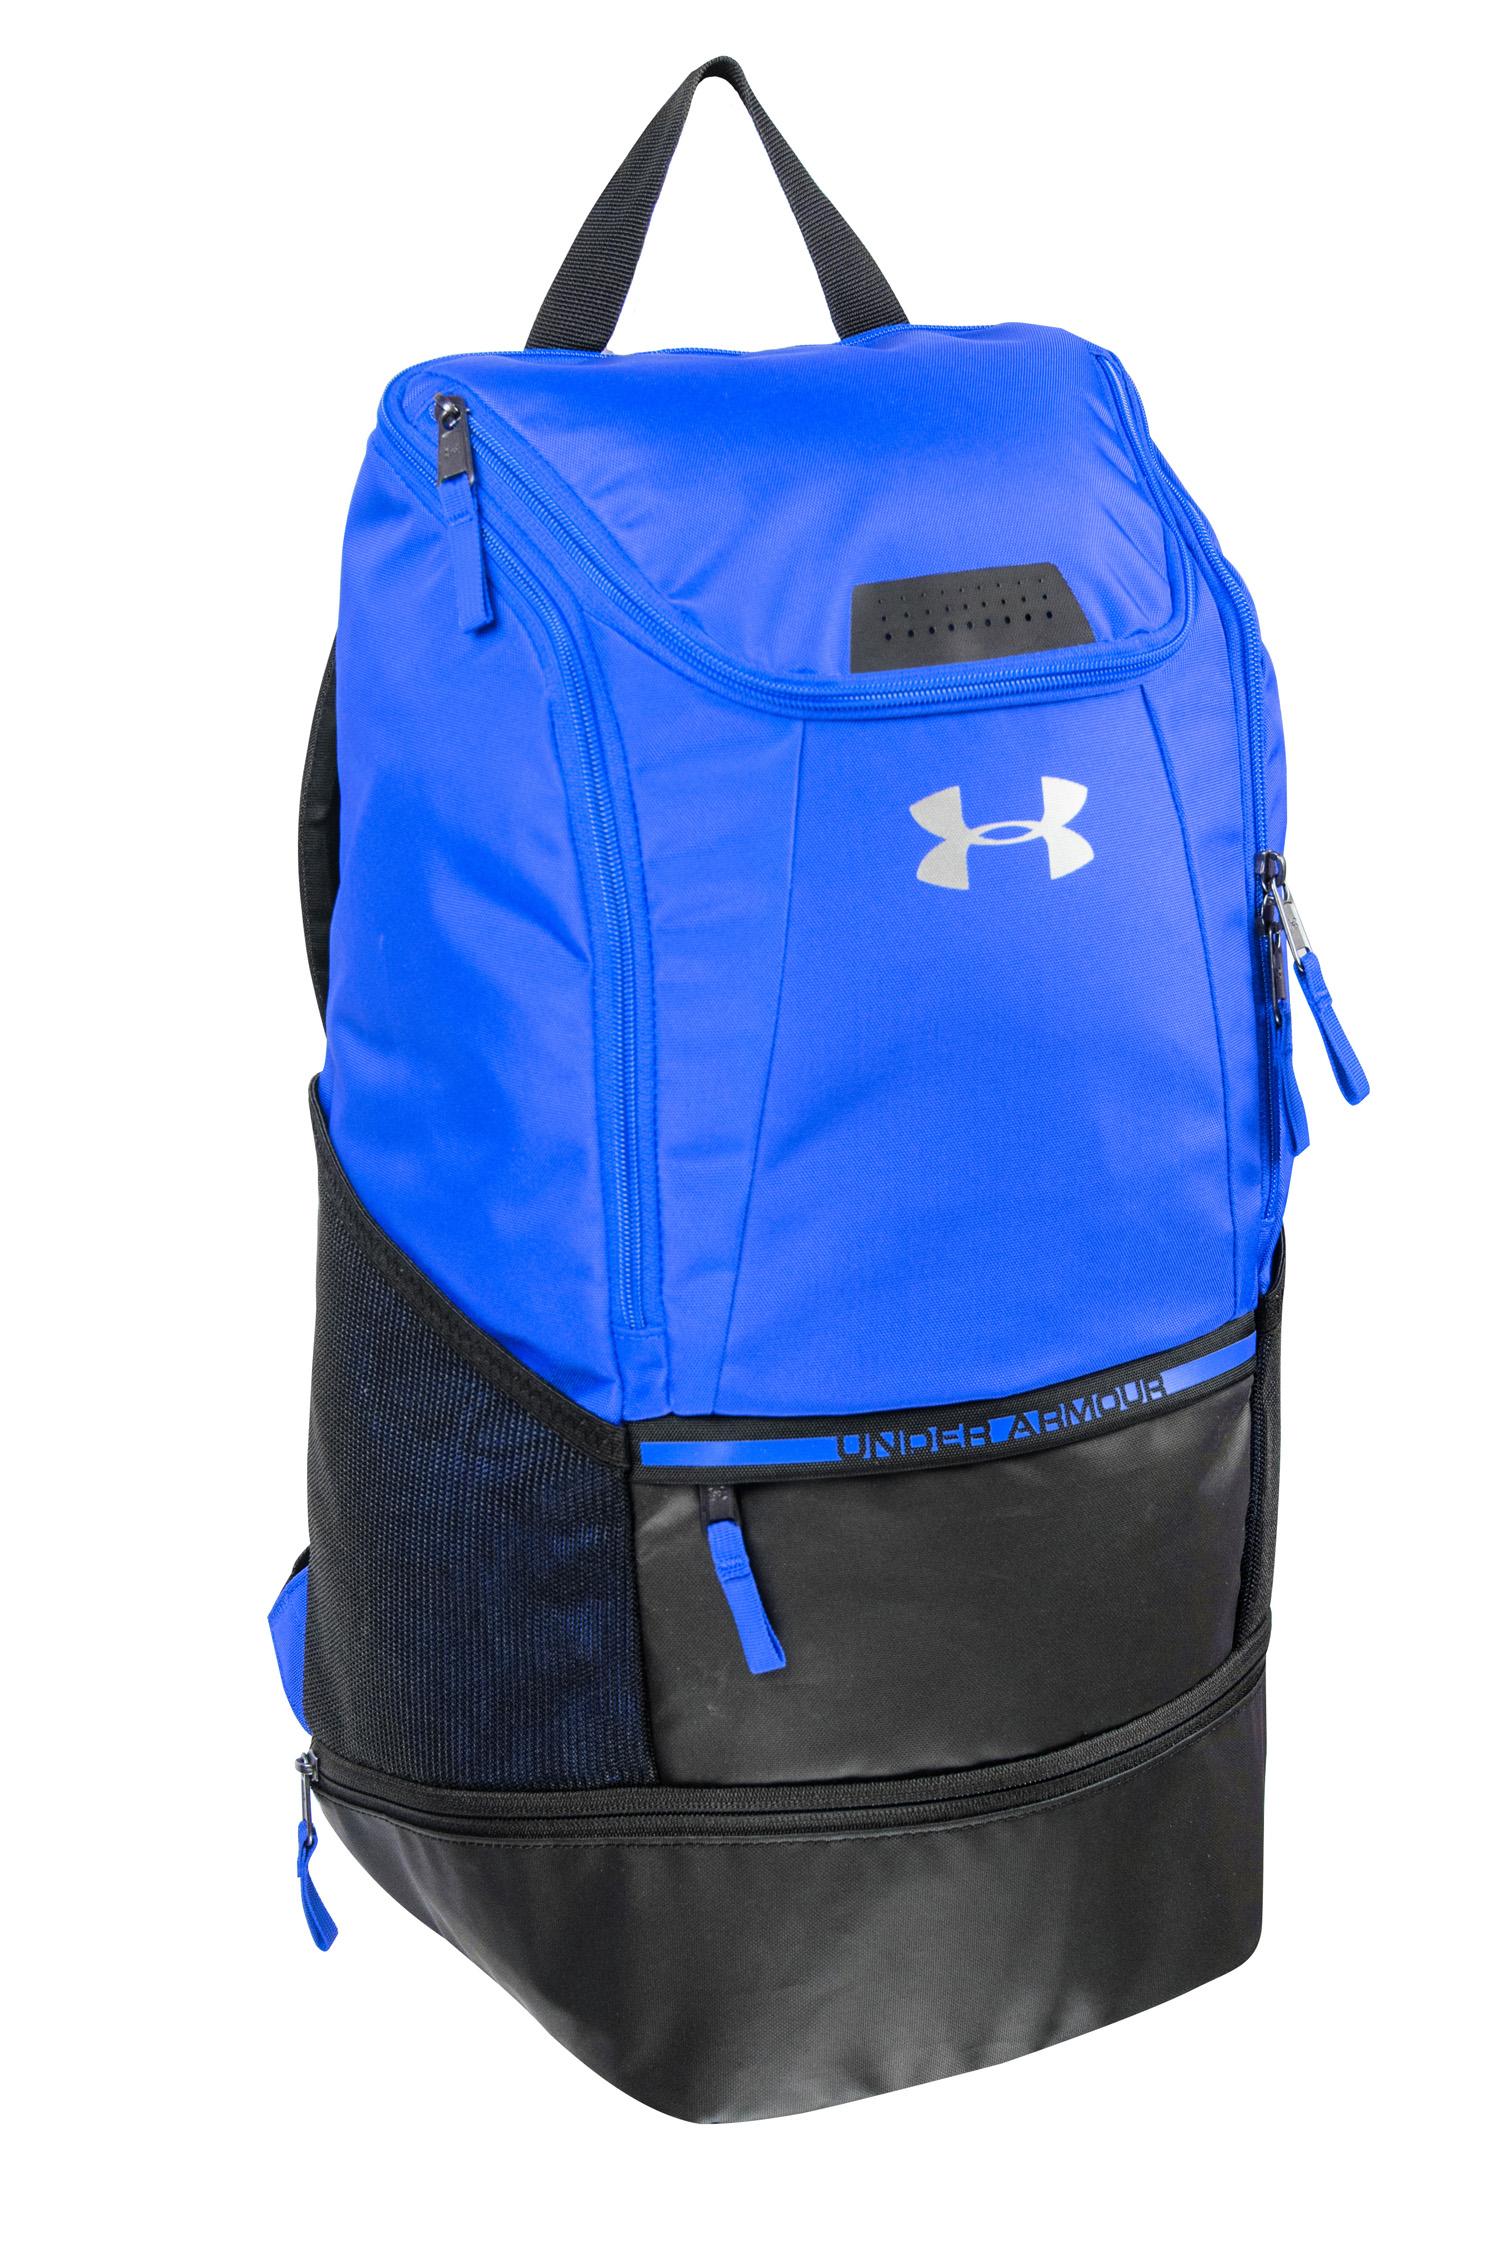 65f9ba9fc4d Men's Under Armour Soccer Backpack Royal 29343991363 | eBay